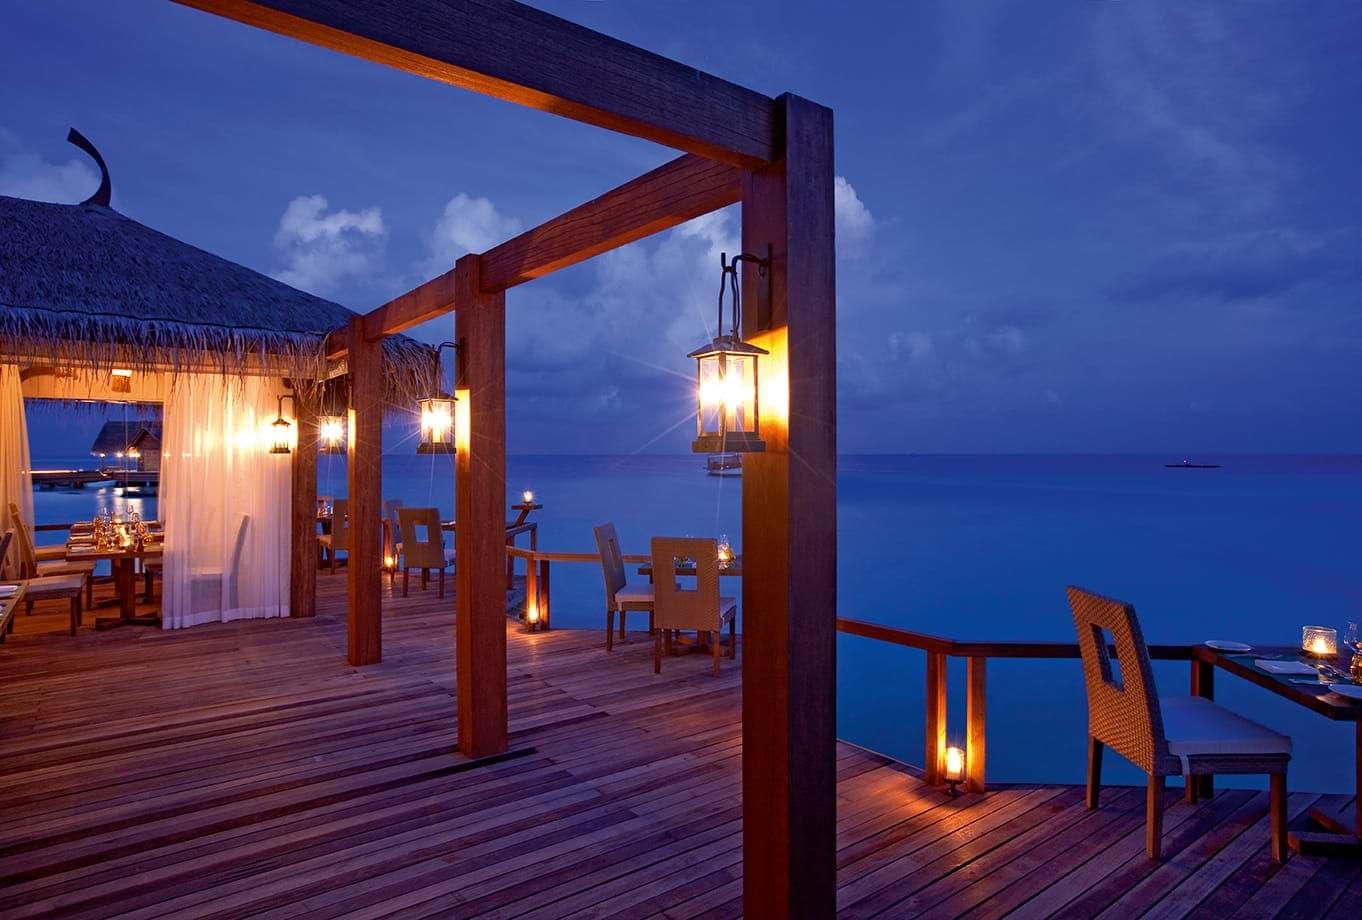 Resort Maldive Constance Moofushi ristorante Manta